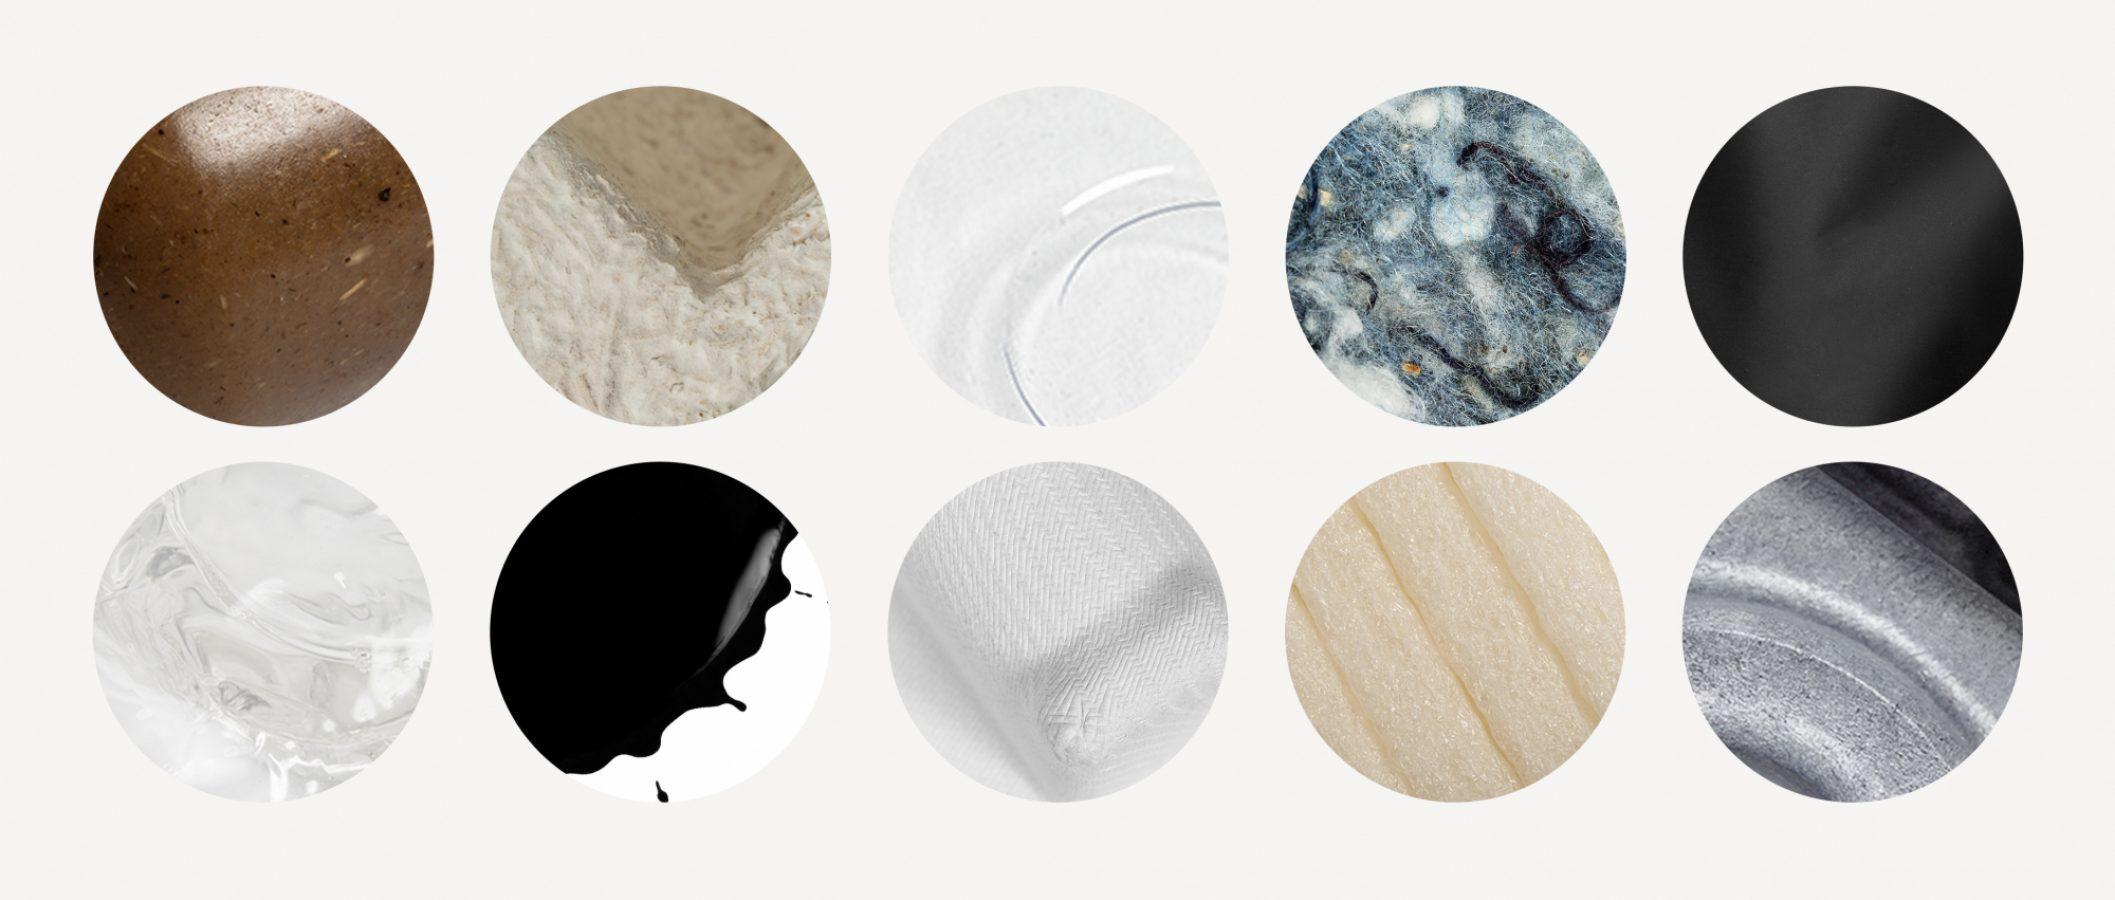 Materials or material